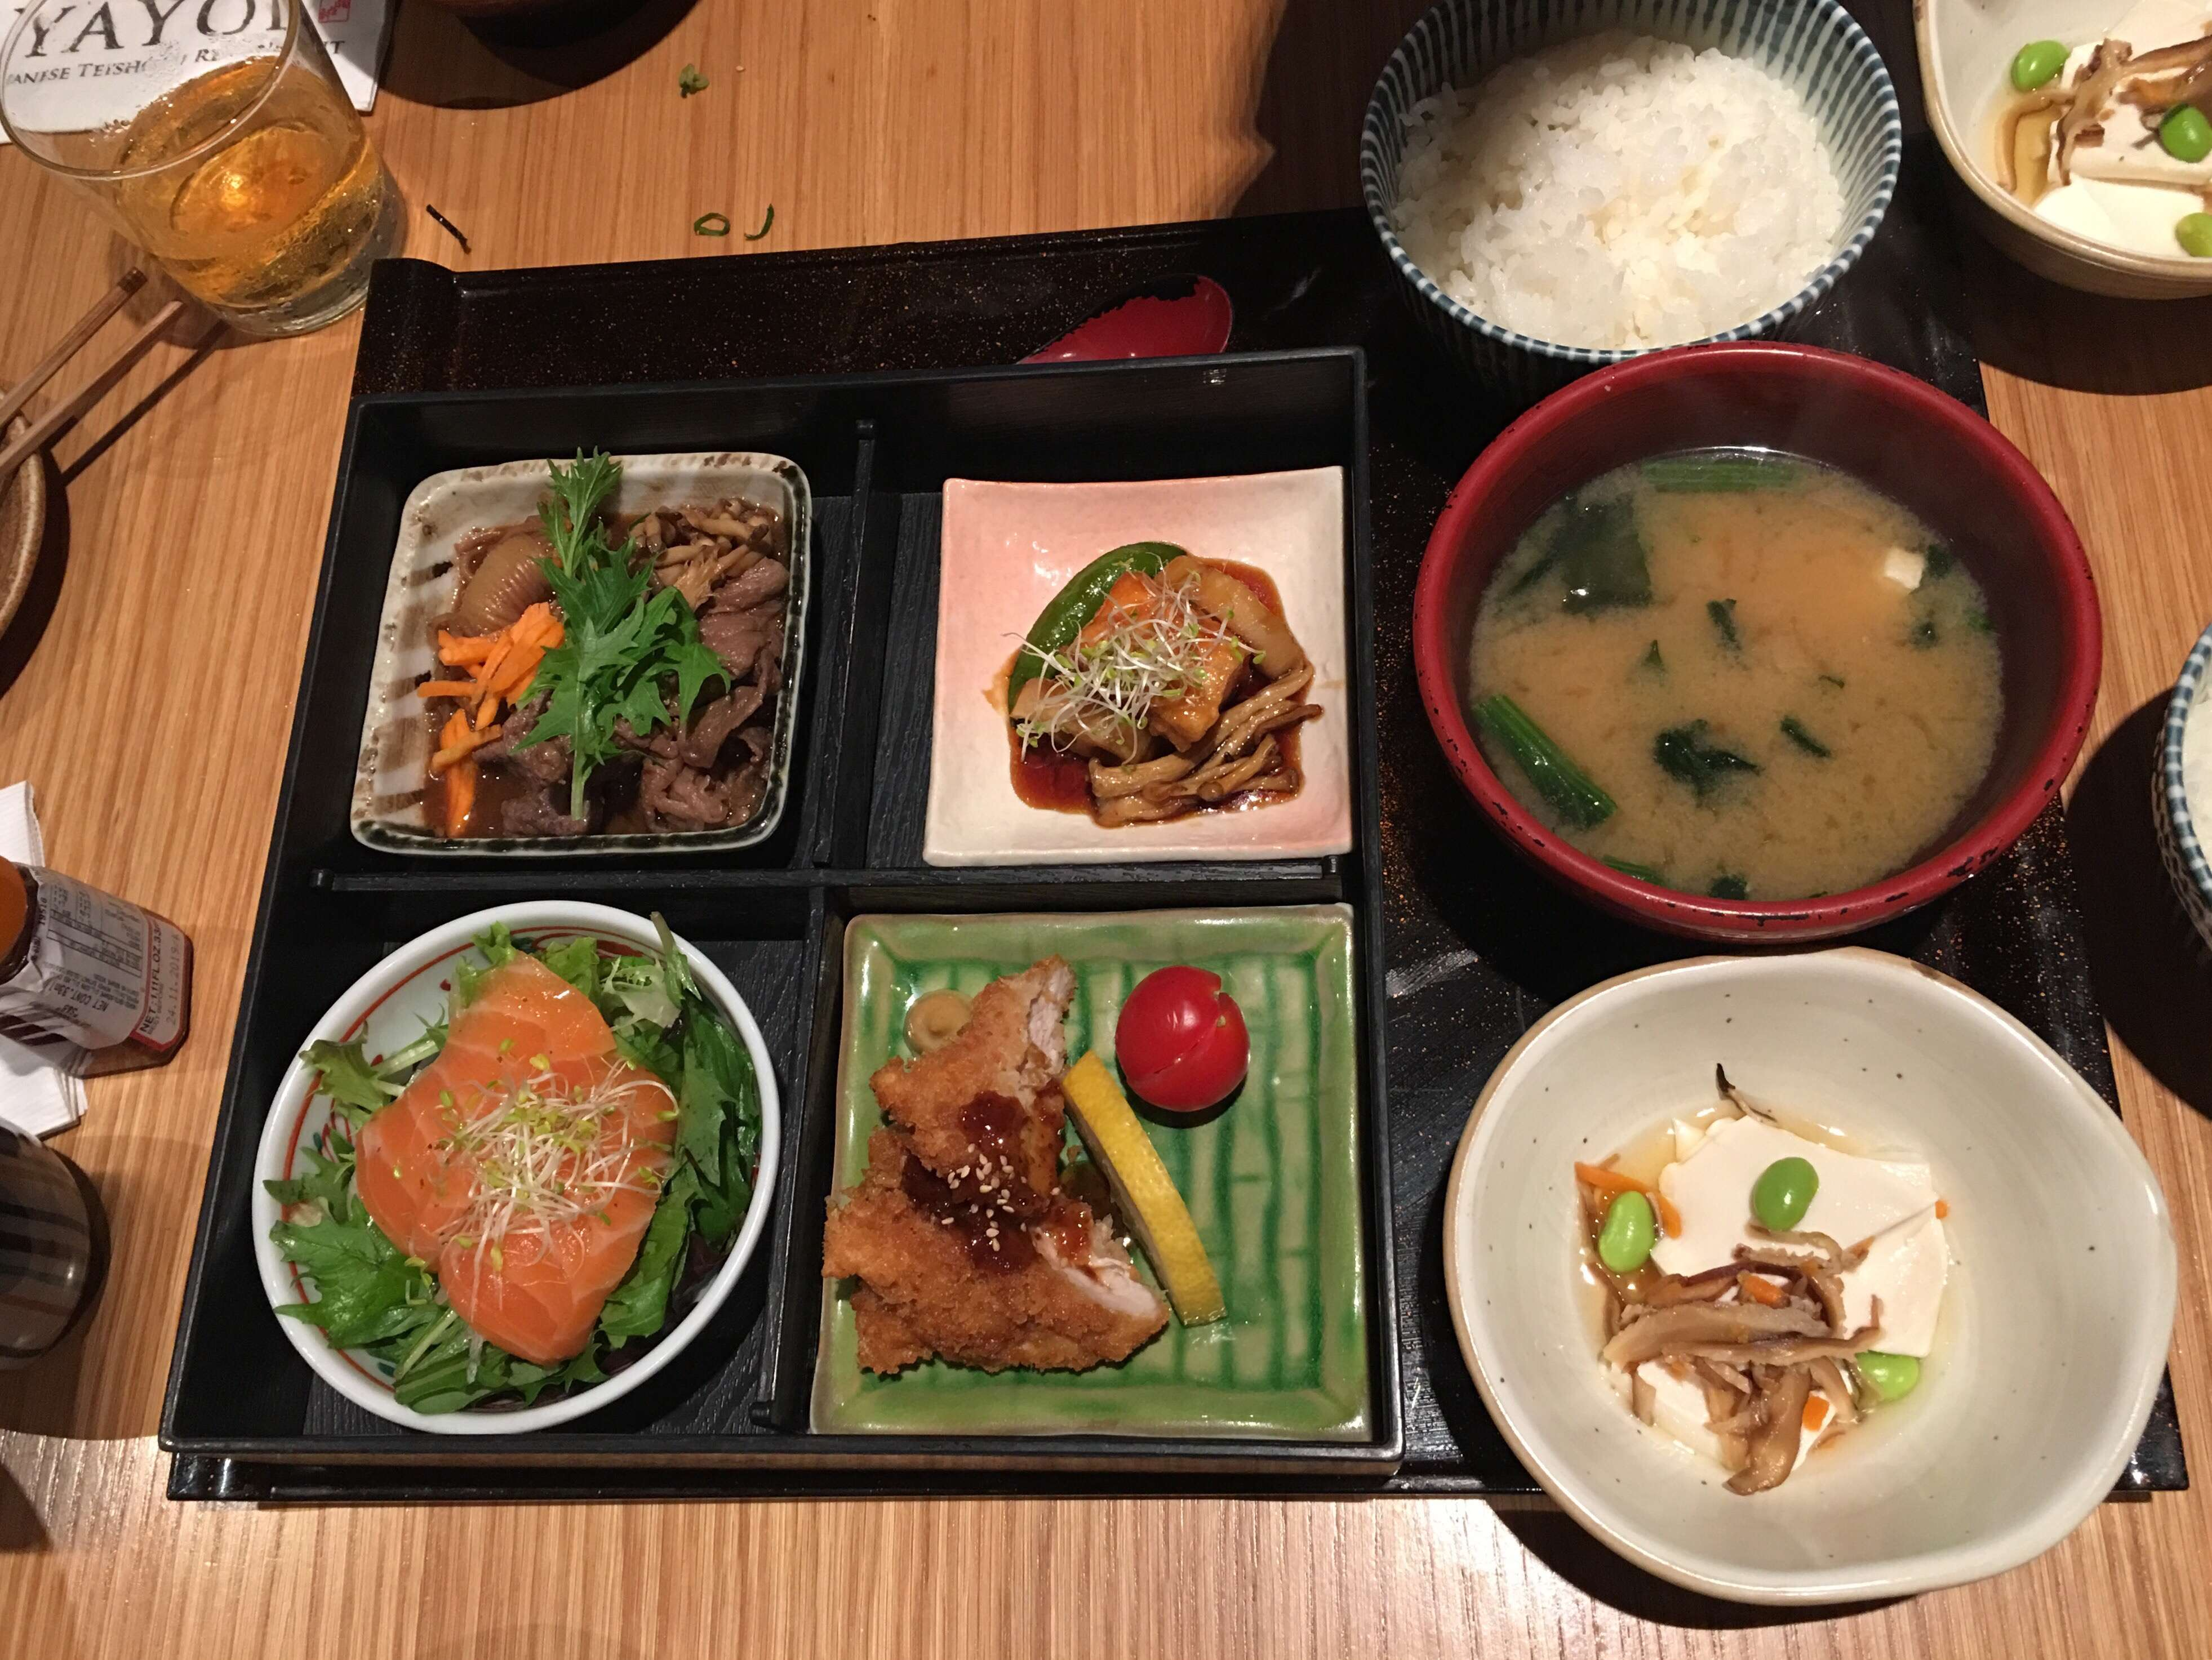 YAYOI Japanese Teishoku Restaurant Westfield Sydney | Level 6, Pitt St & Market Street, Sydney, New South Wales 2000 | +61 2 8317 6350